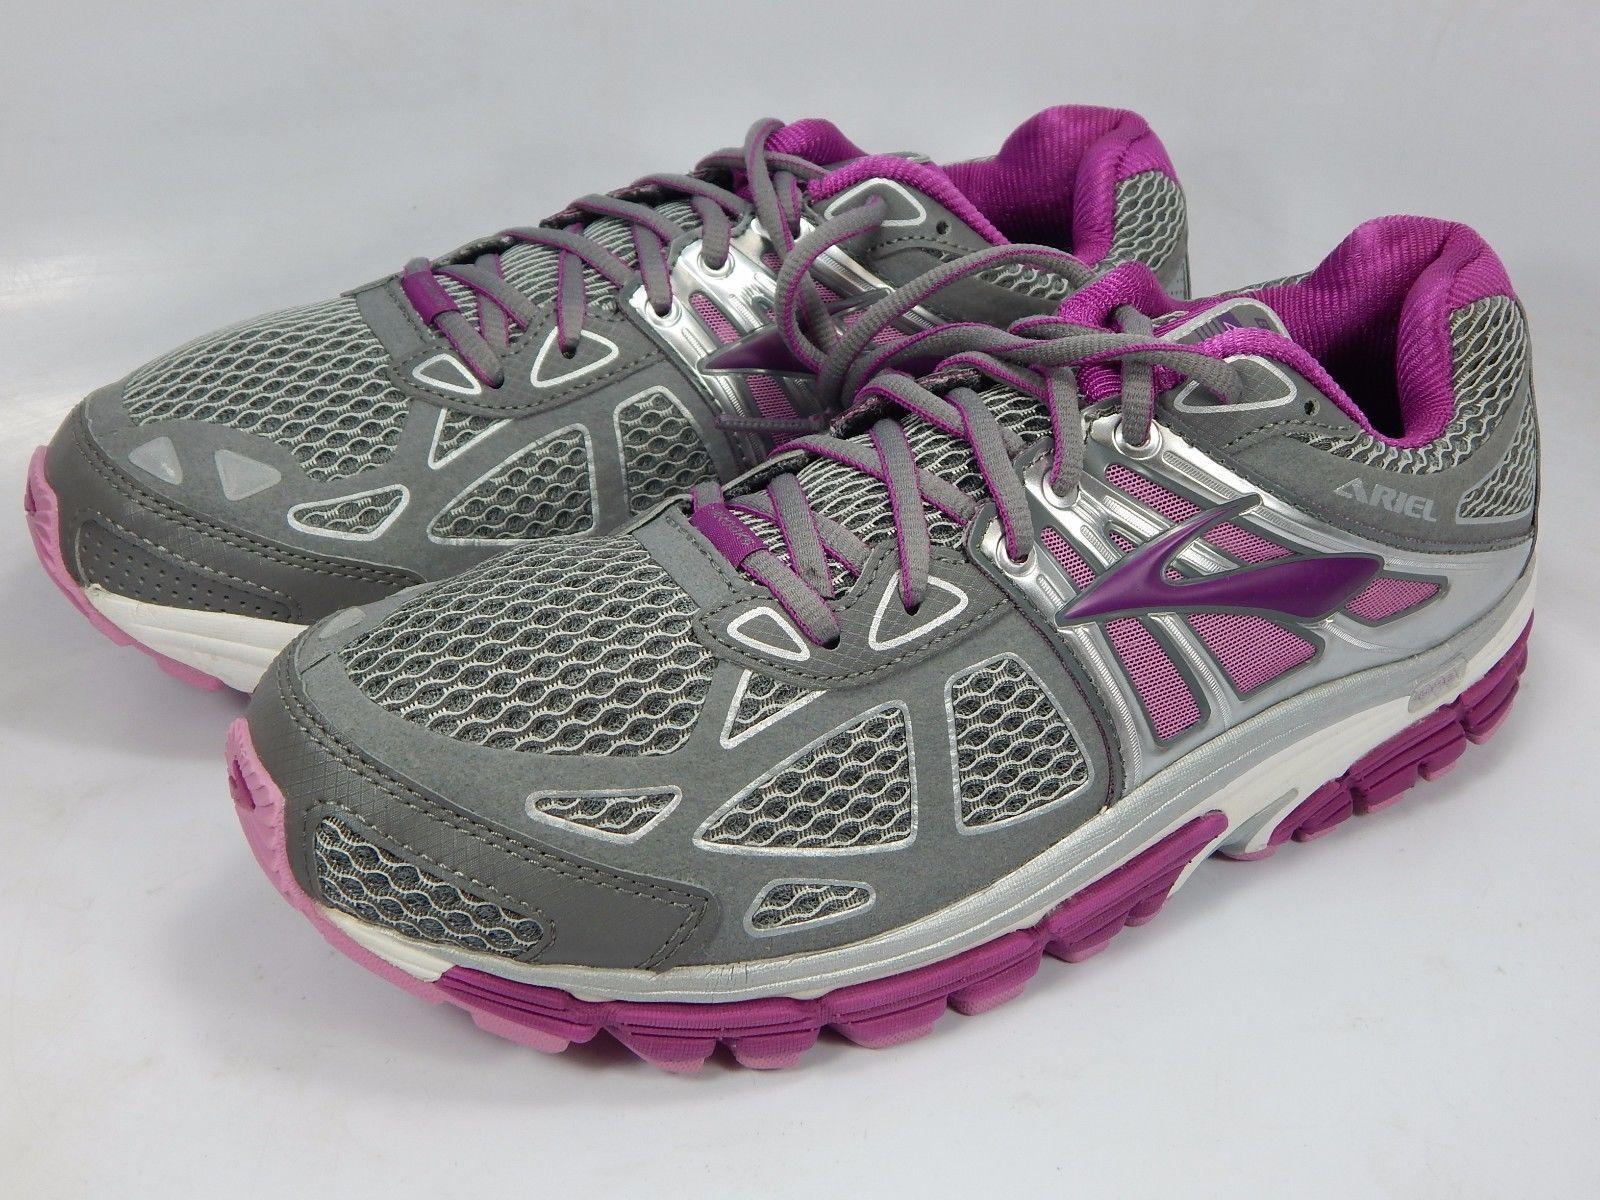 Brooks Ariel 14 Women's Running Shoes Size US 11 M (B) EU 43 Gray  1201641B085